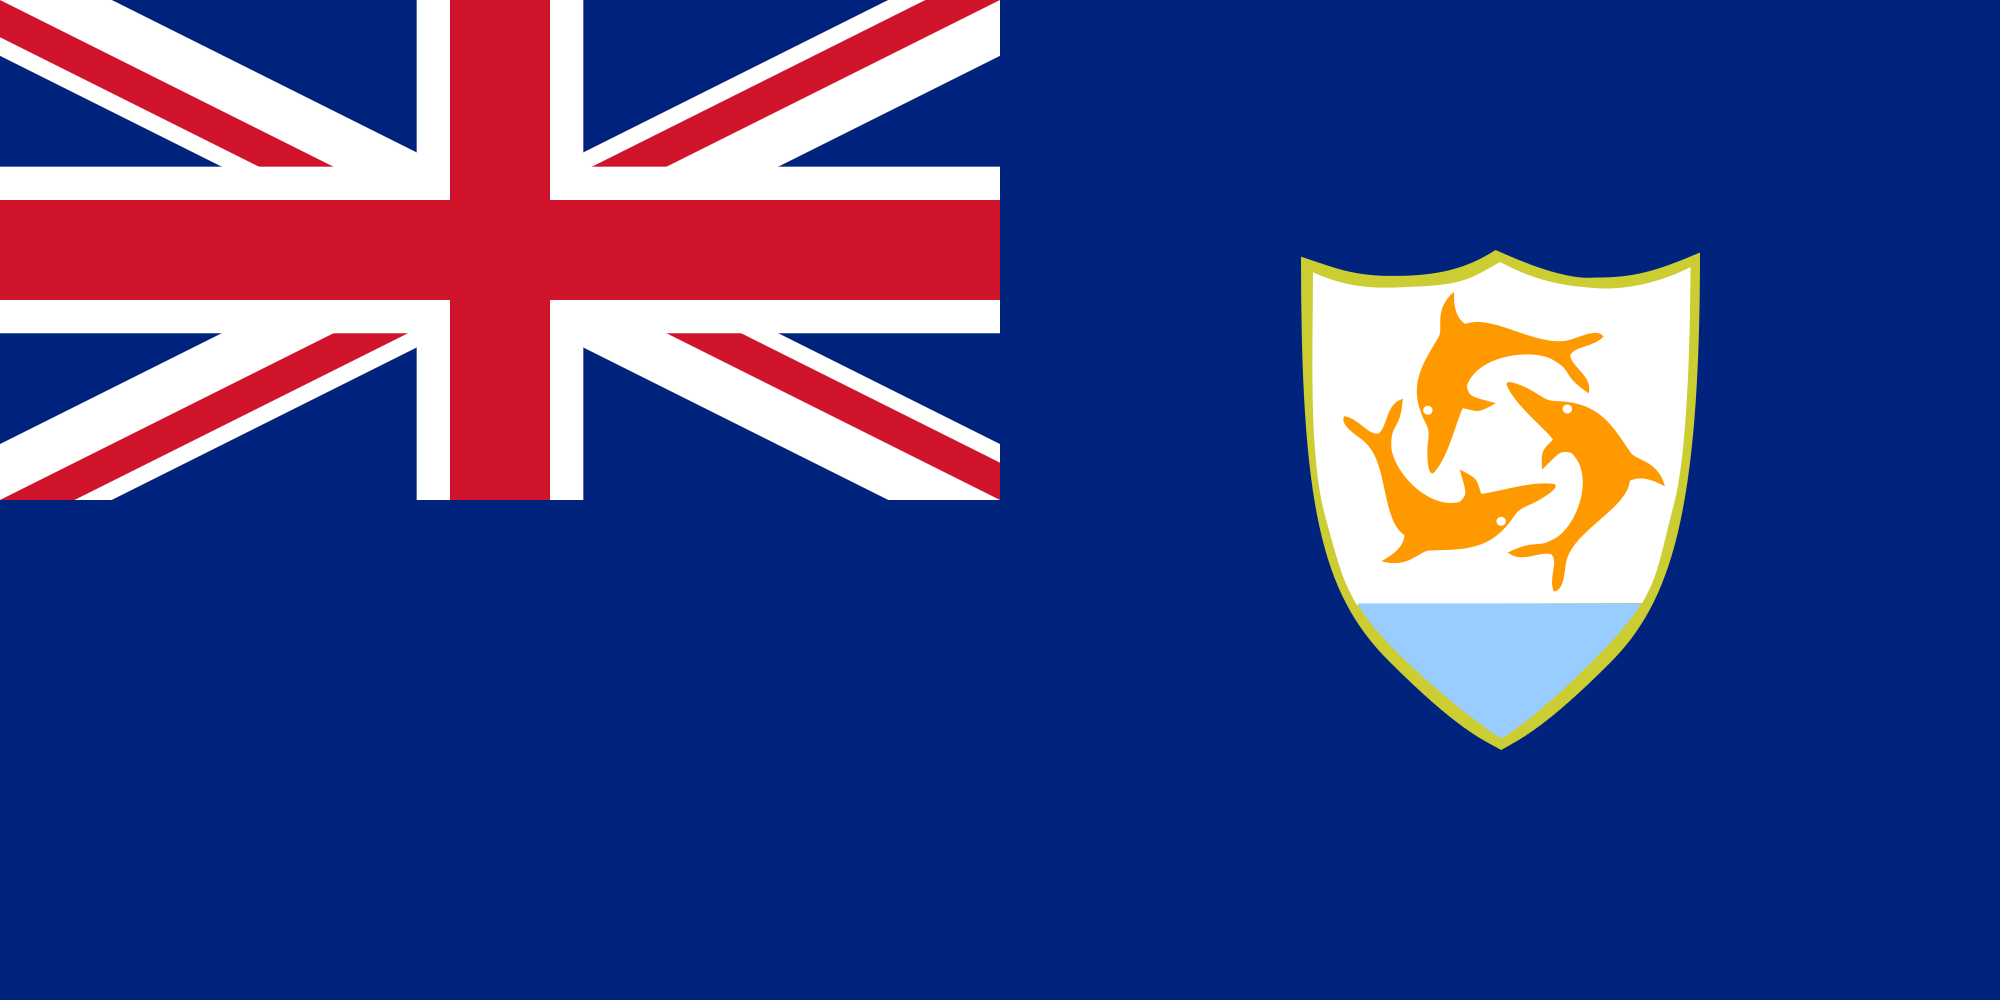 anguila, país, emblema, insignia, प्रतीक - HD वॉलपेपर - प्रोफेसर-falken.com